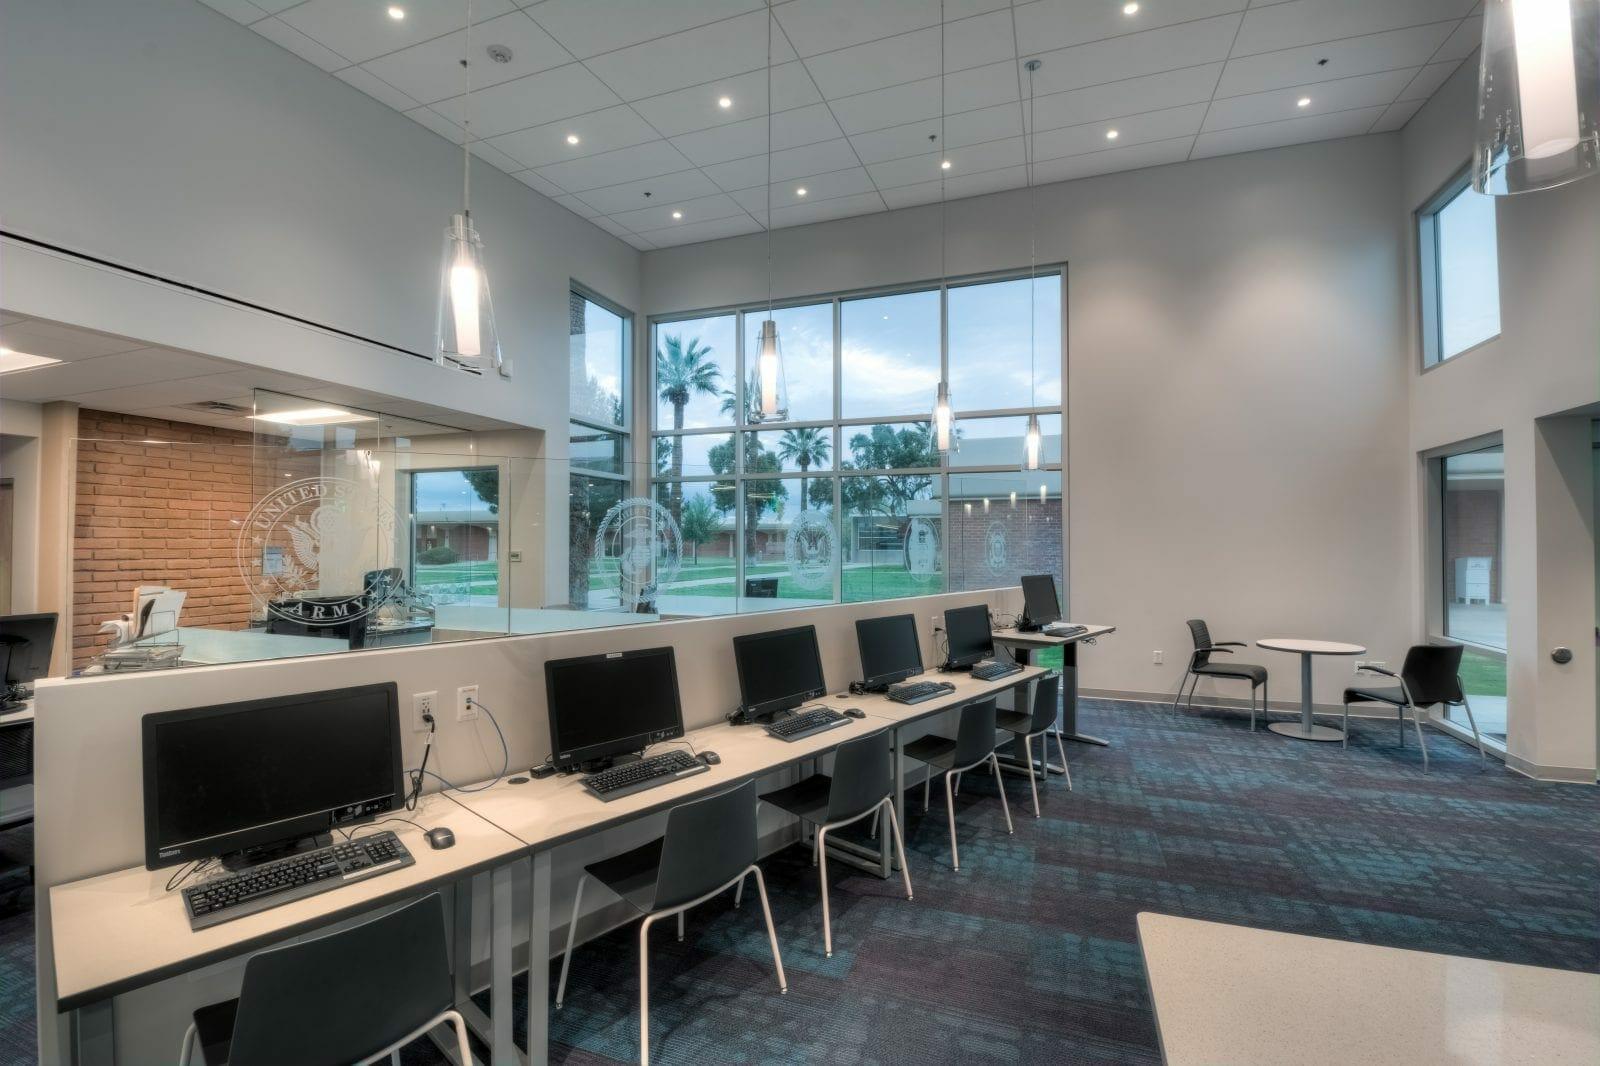 Glendale Community College   Veteran Center